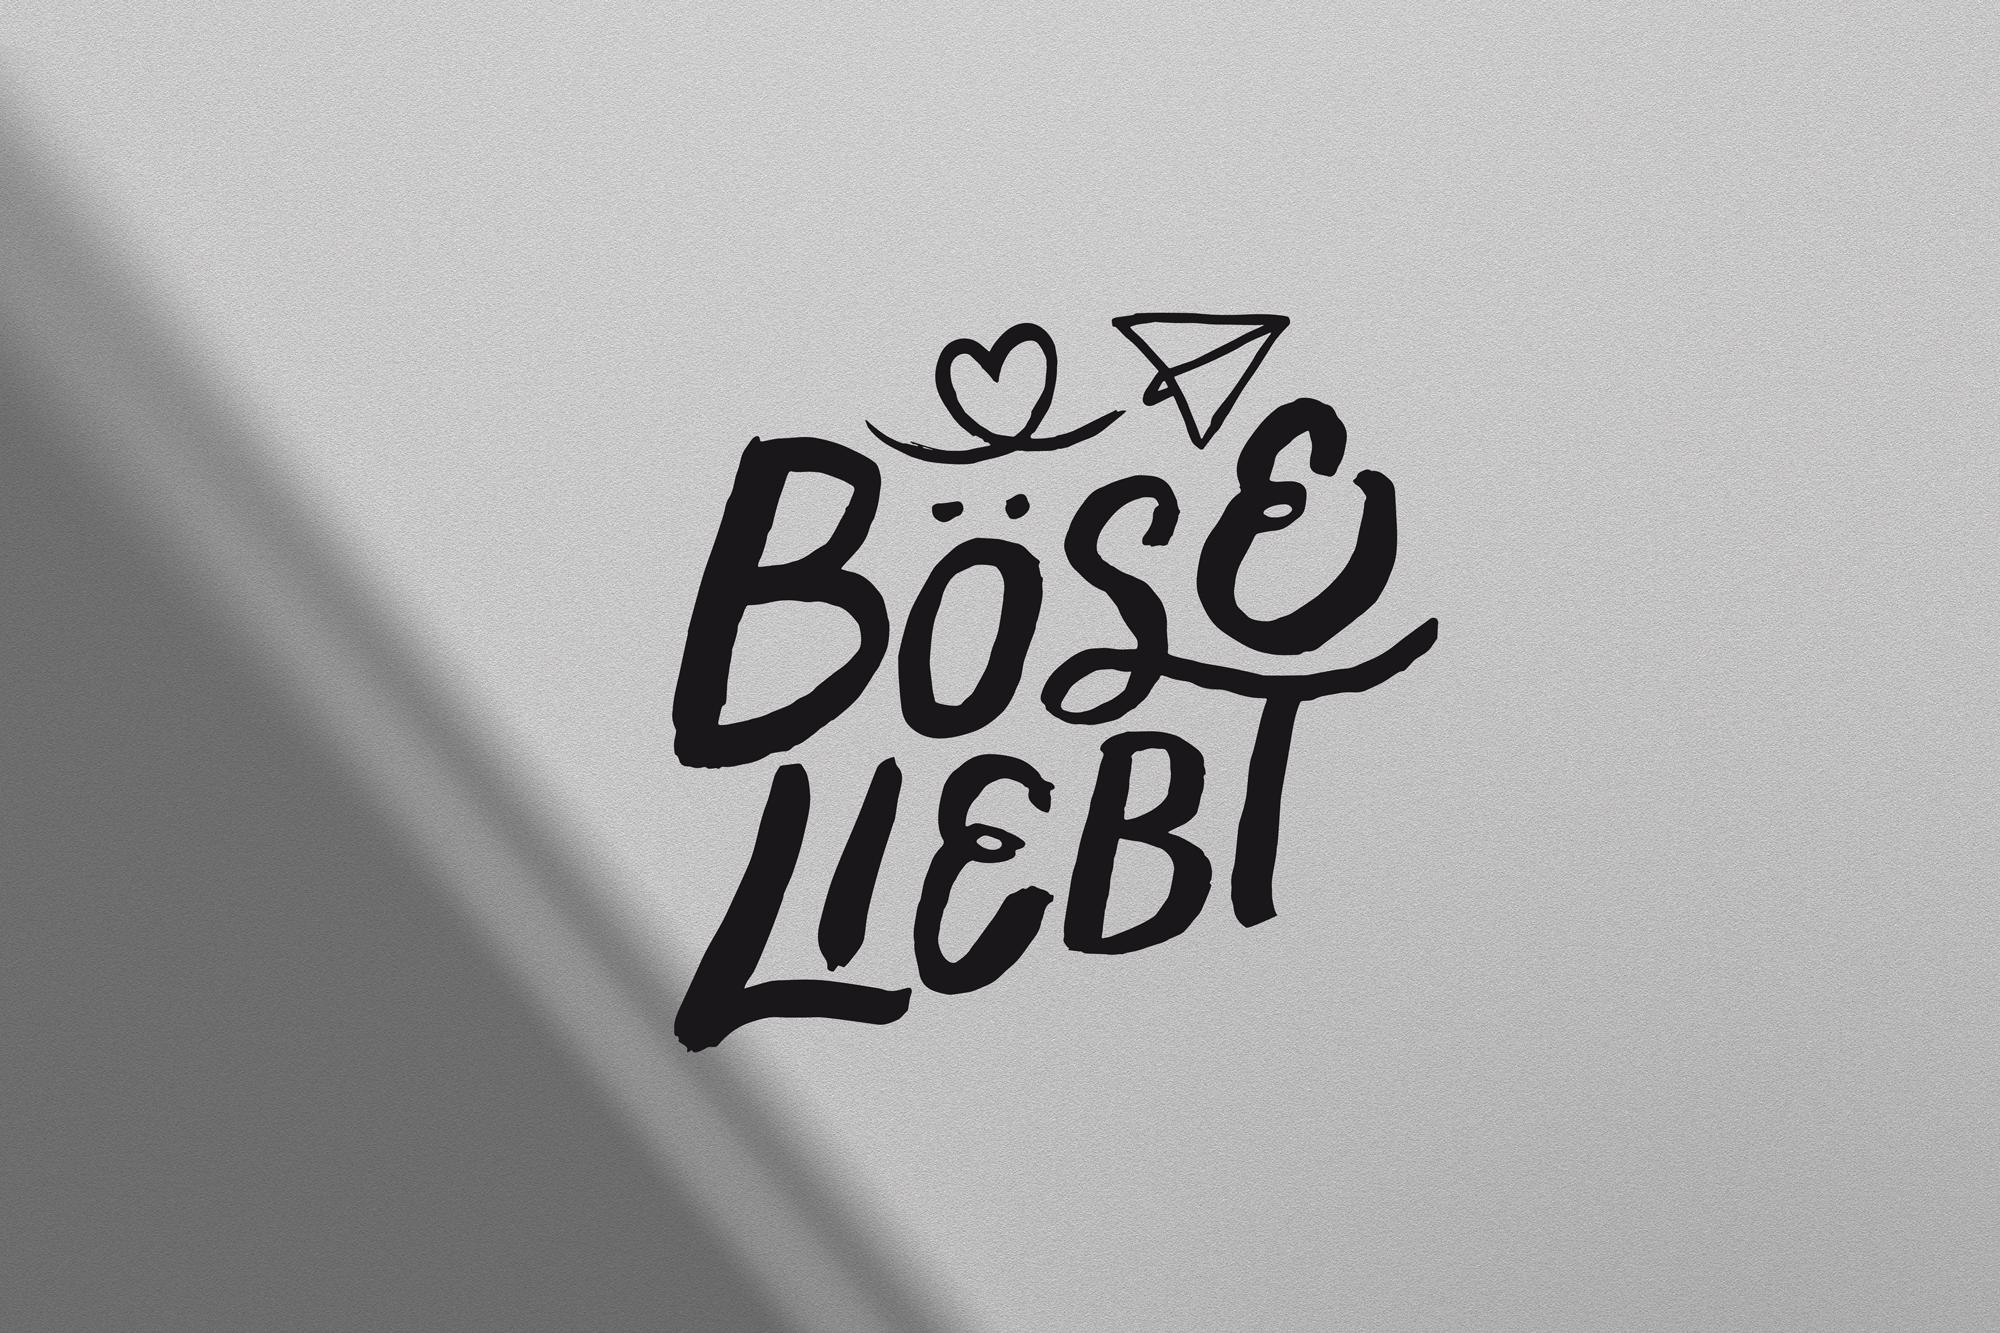 Böseliebt_logo_mockup2